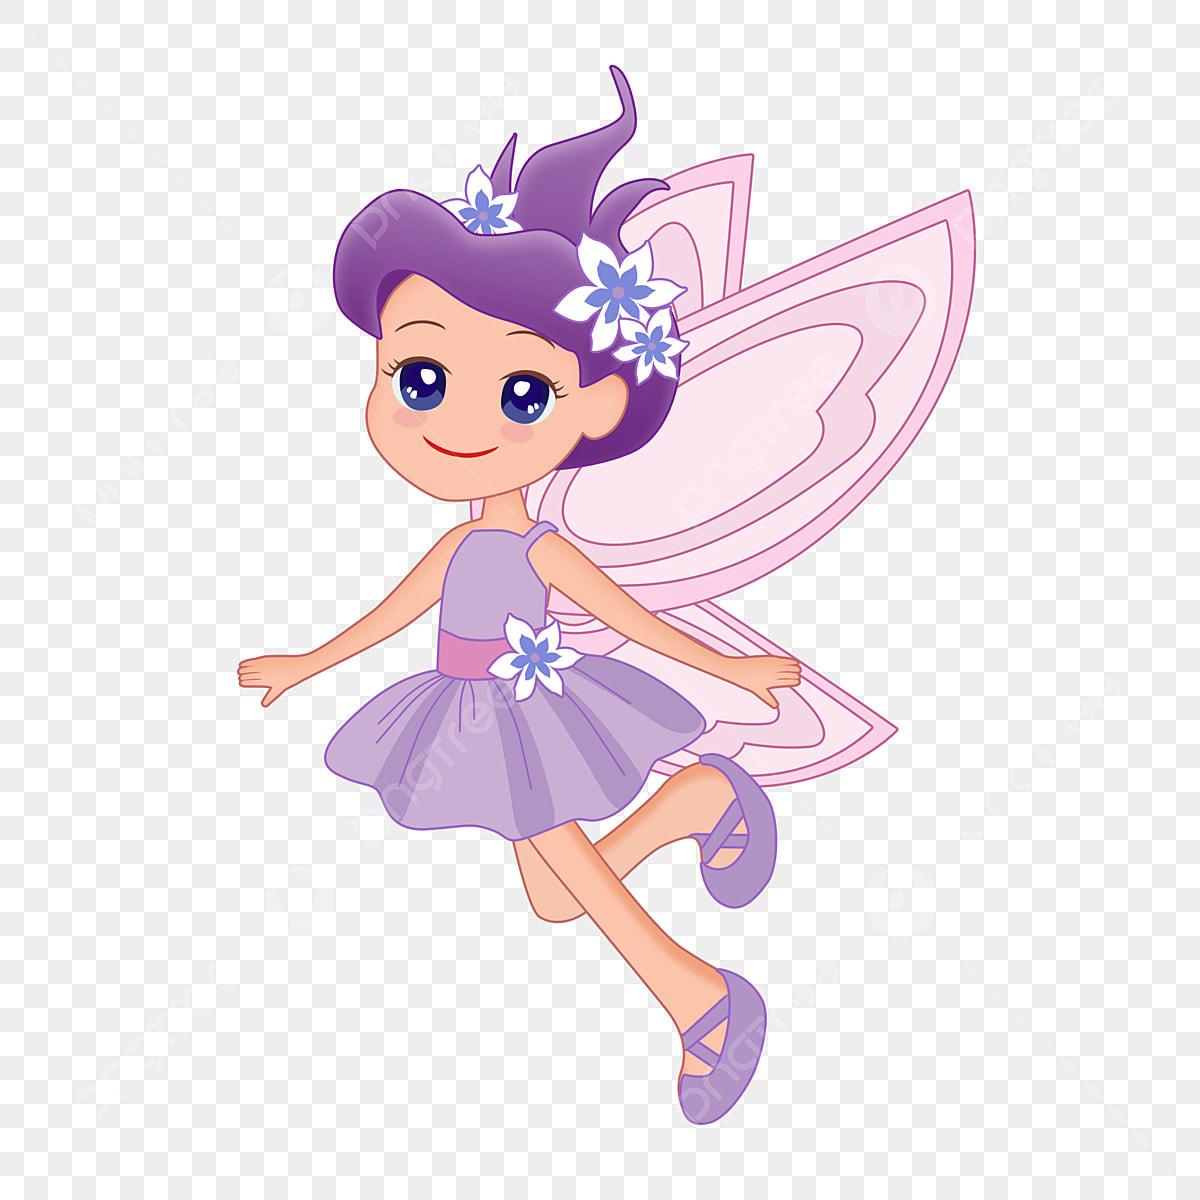 Flower Fairy Cartoon Flower Fairy Fantasy Creature Cute